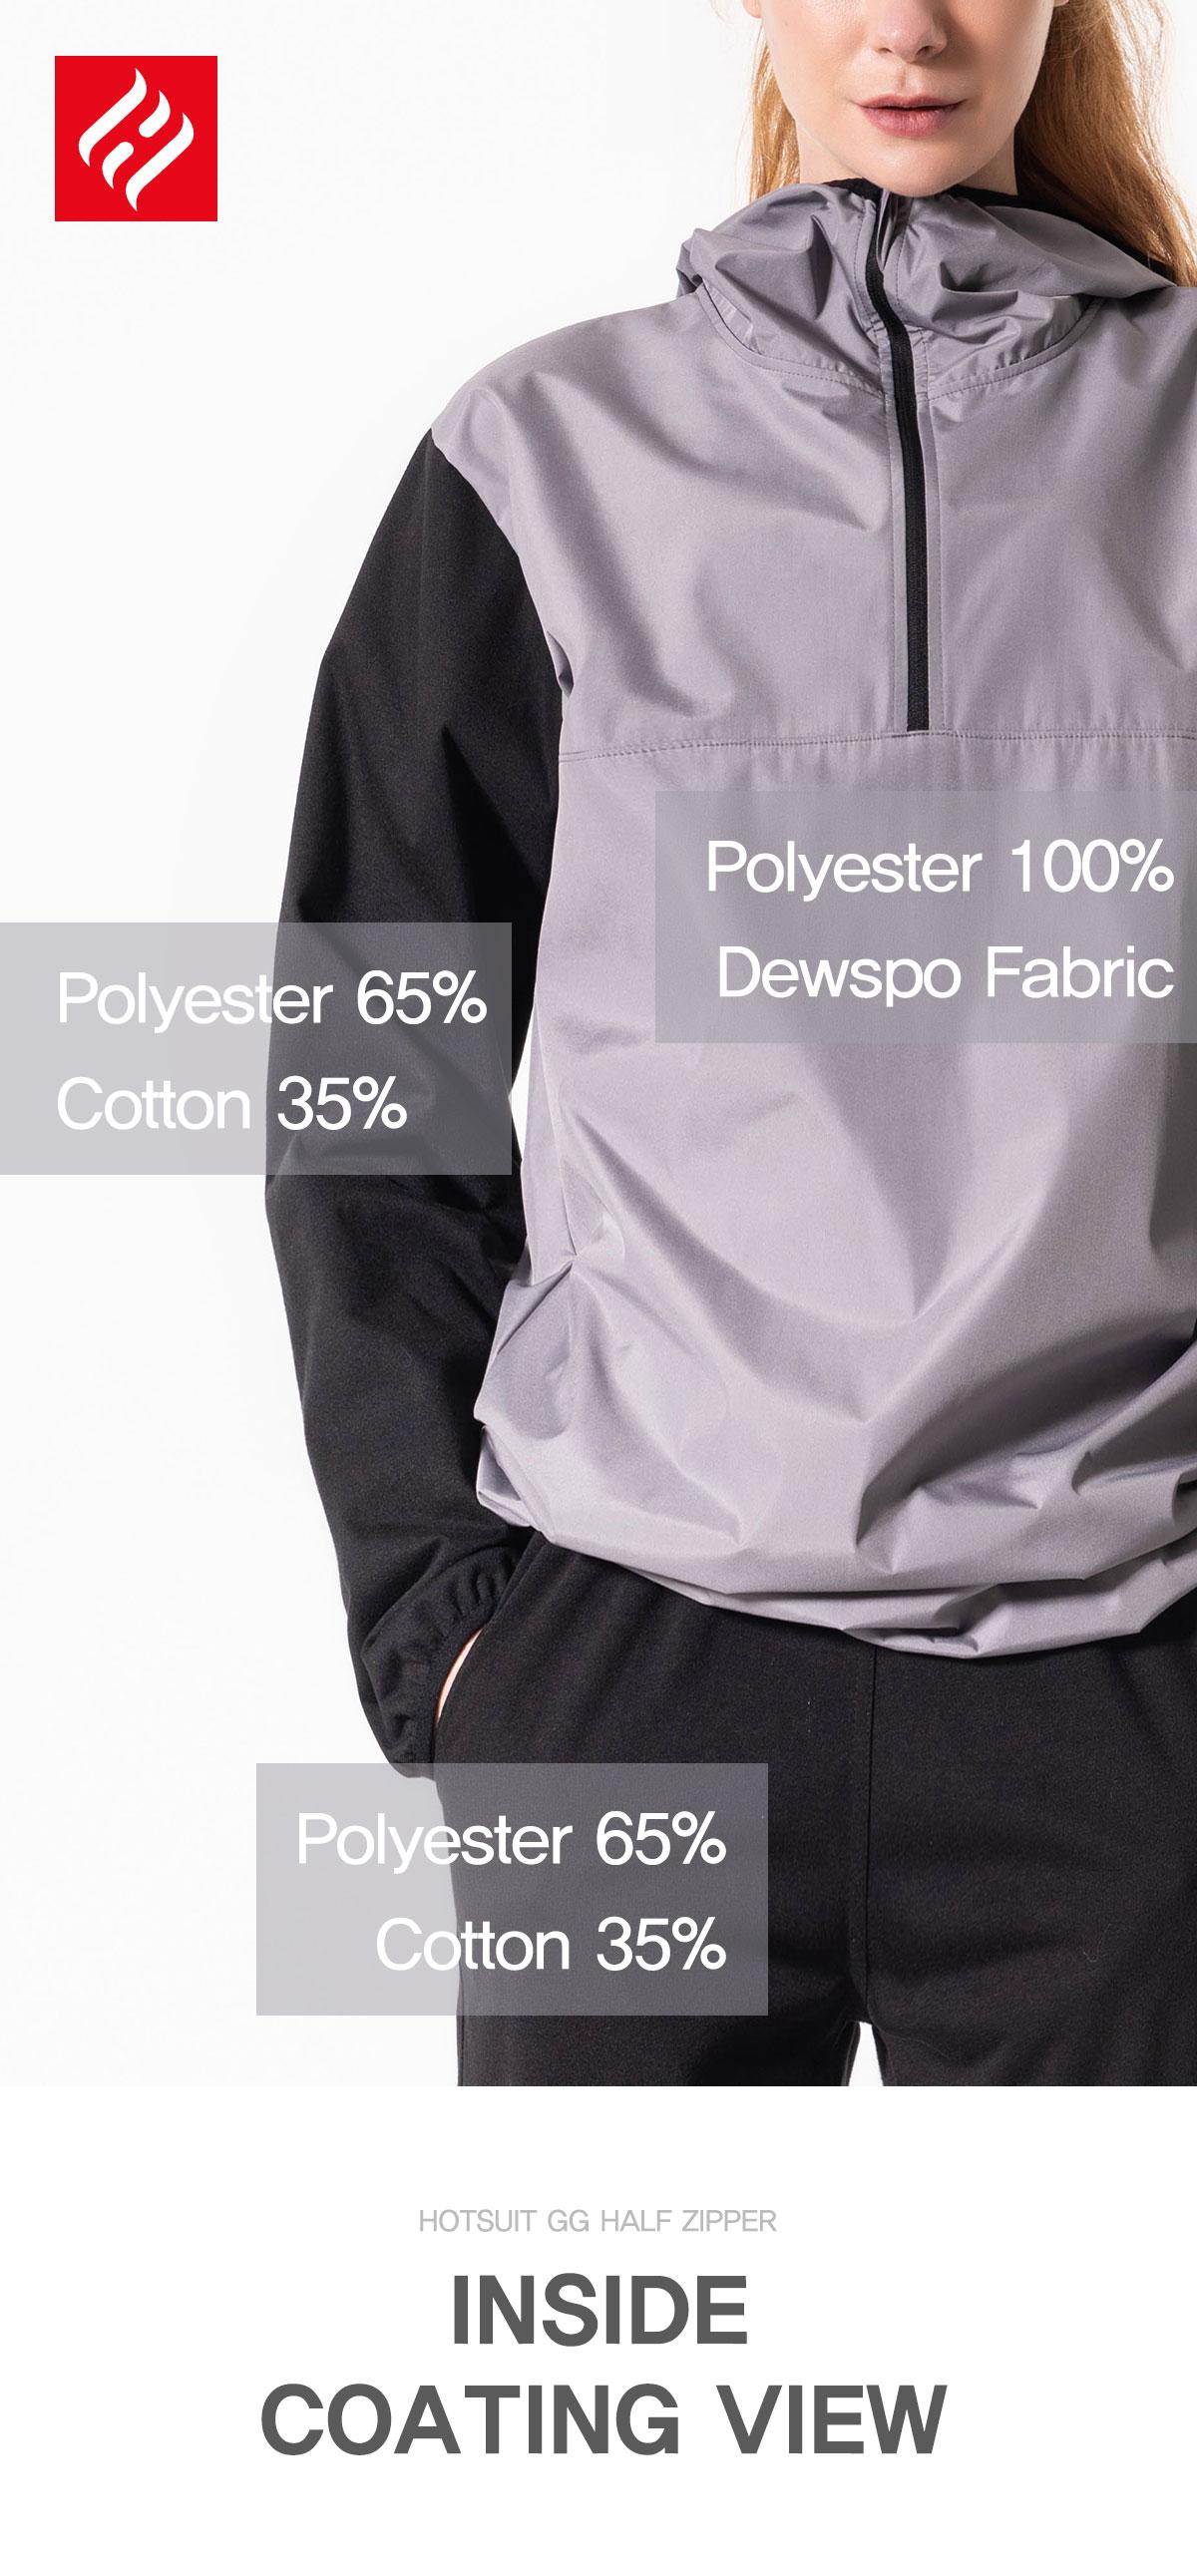 Polyester 100% Dewspo Fabric Polyester 65% Cotton 35%